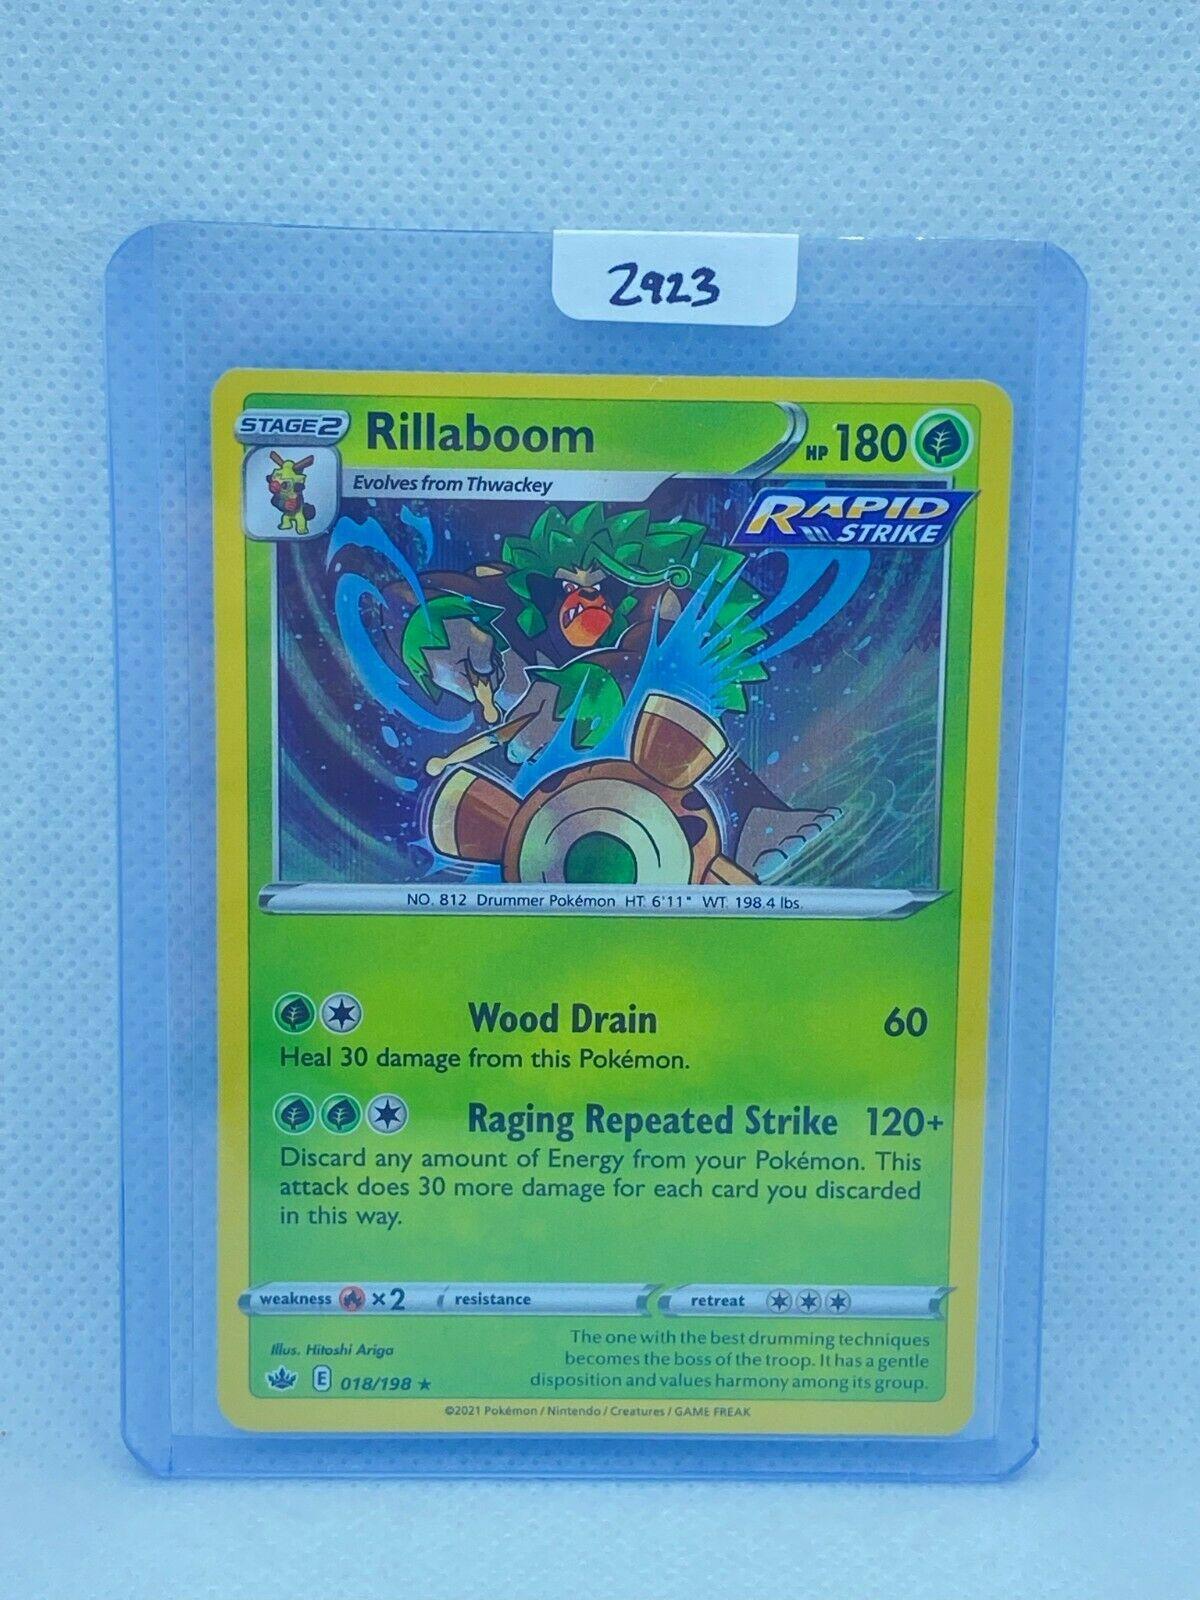 Pokémon TCG Rillaboom Holo 018/198   Chilling Reign   Play/Grade Ready